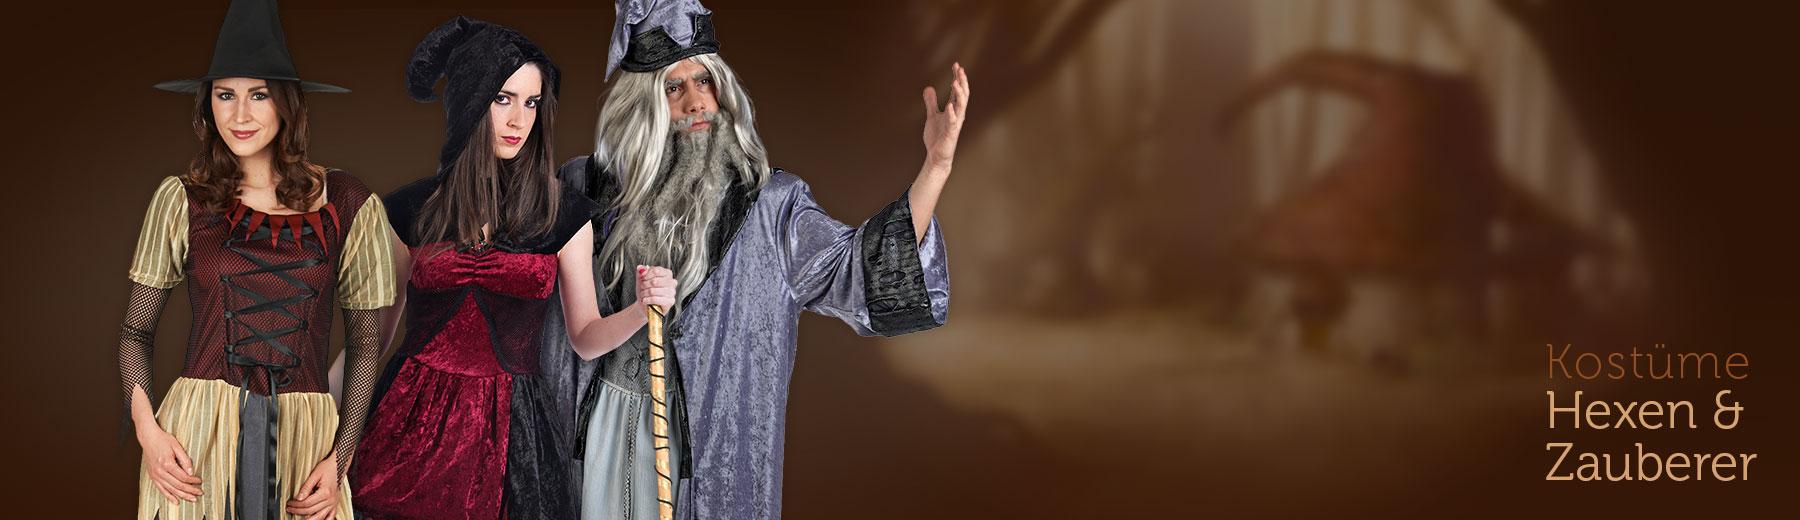 Hexen & Zauberer Kostüme